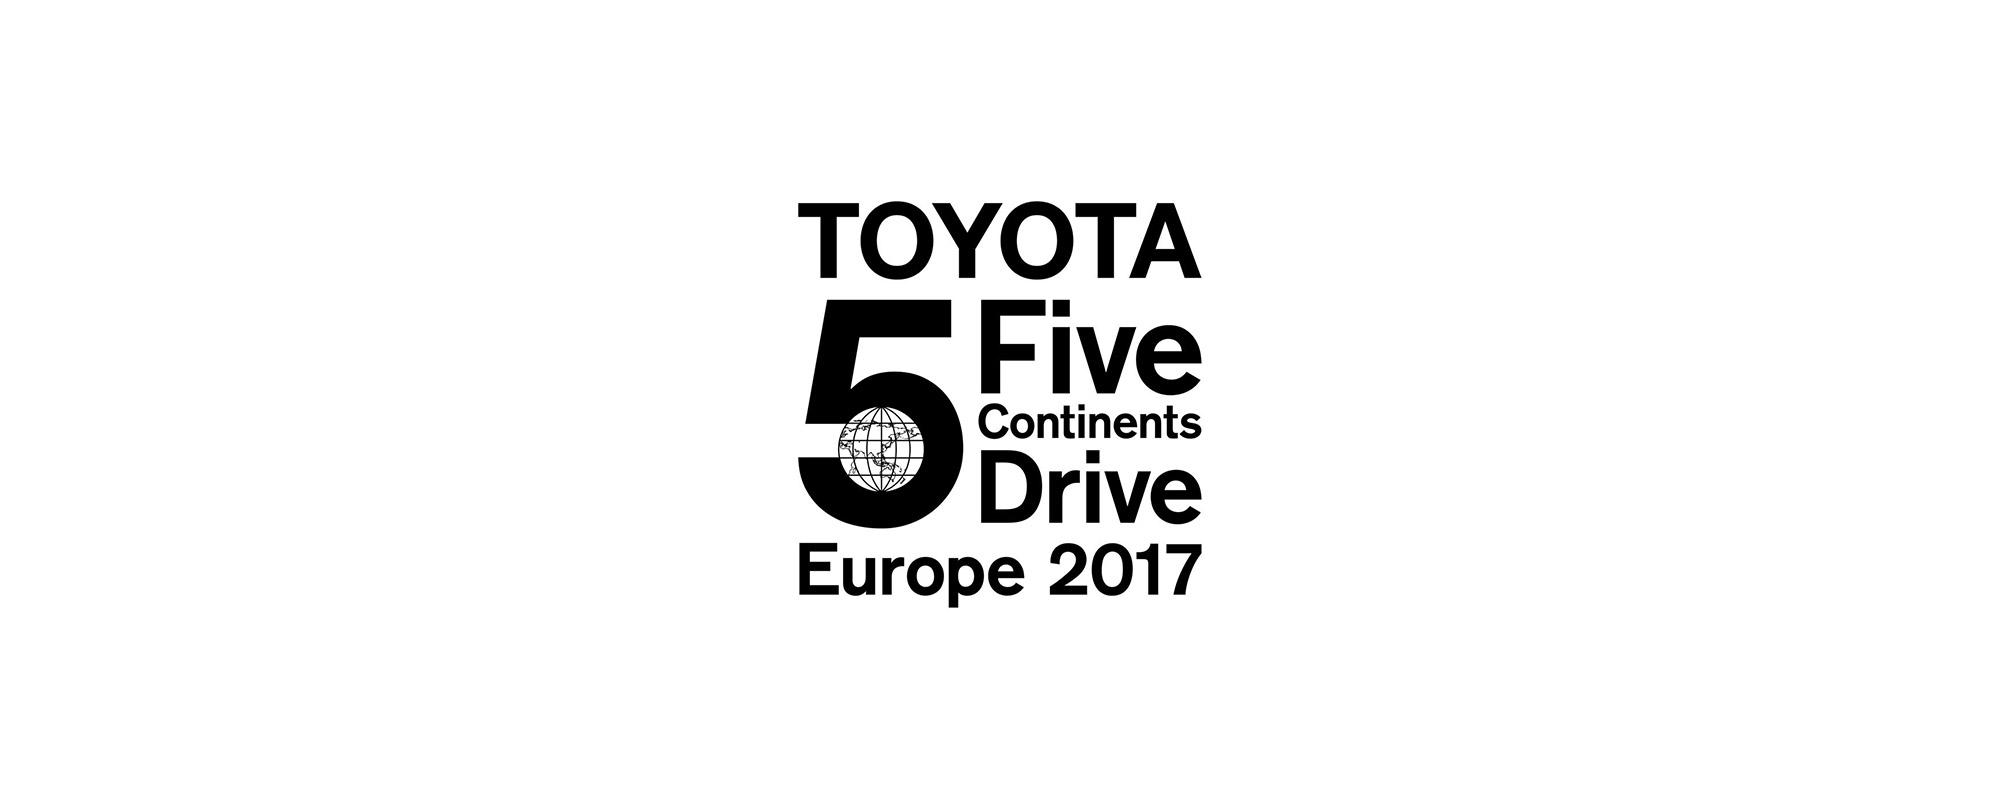 Mega-testrit Toyota Five Continents Drive Project bezoekt Europa